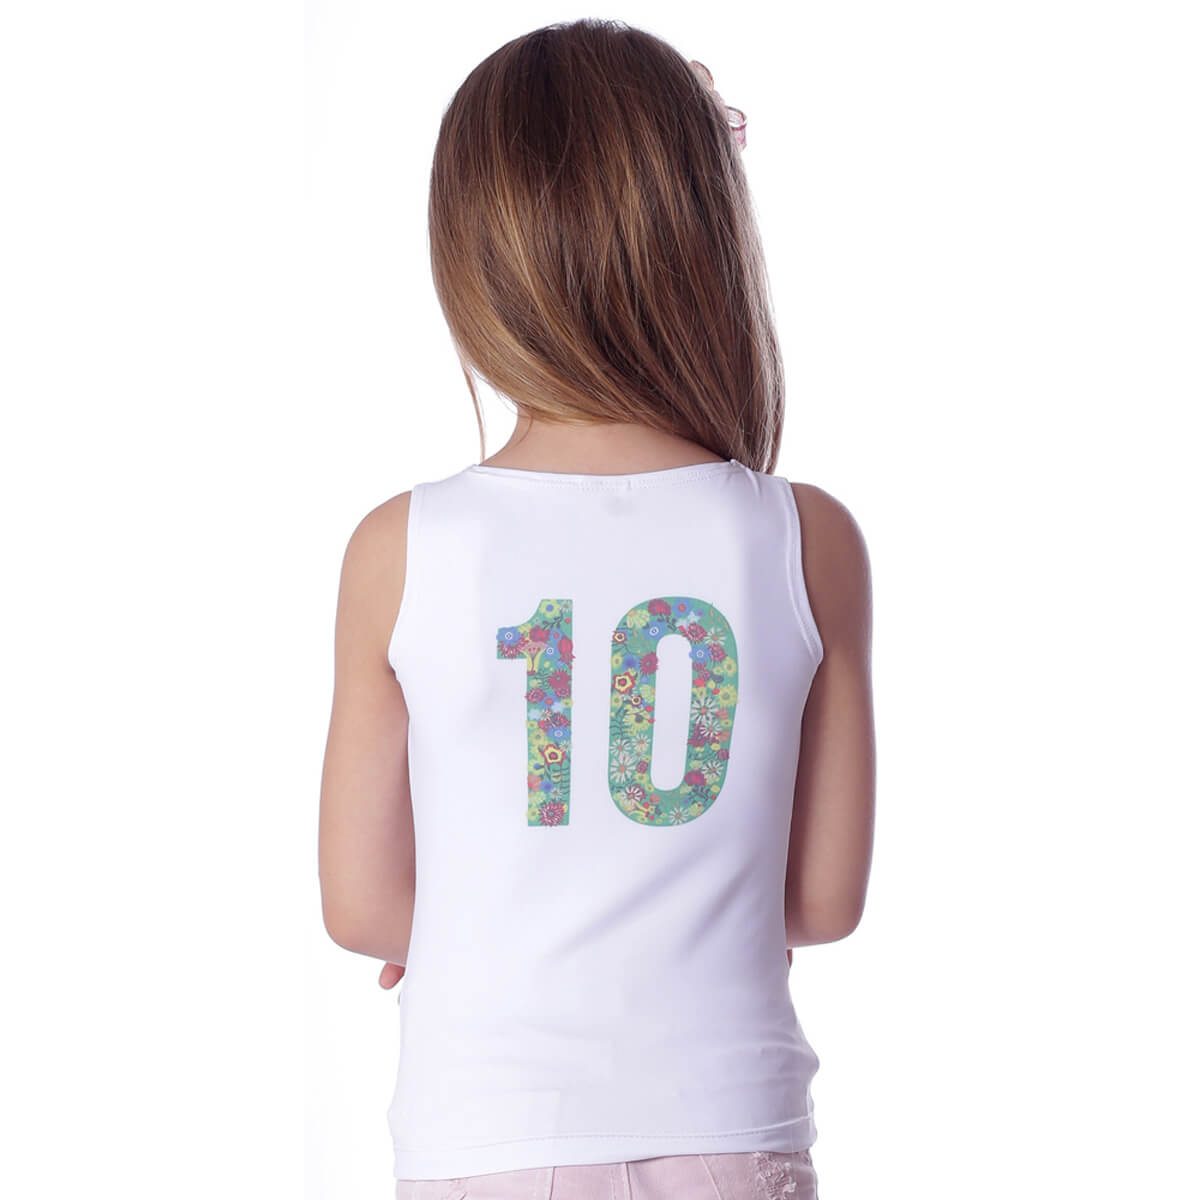 Regata Infantil Estampa Exclusiva Copa do Mundo BRASIL 10 Decote Canoa